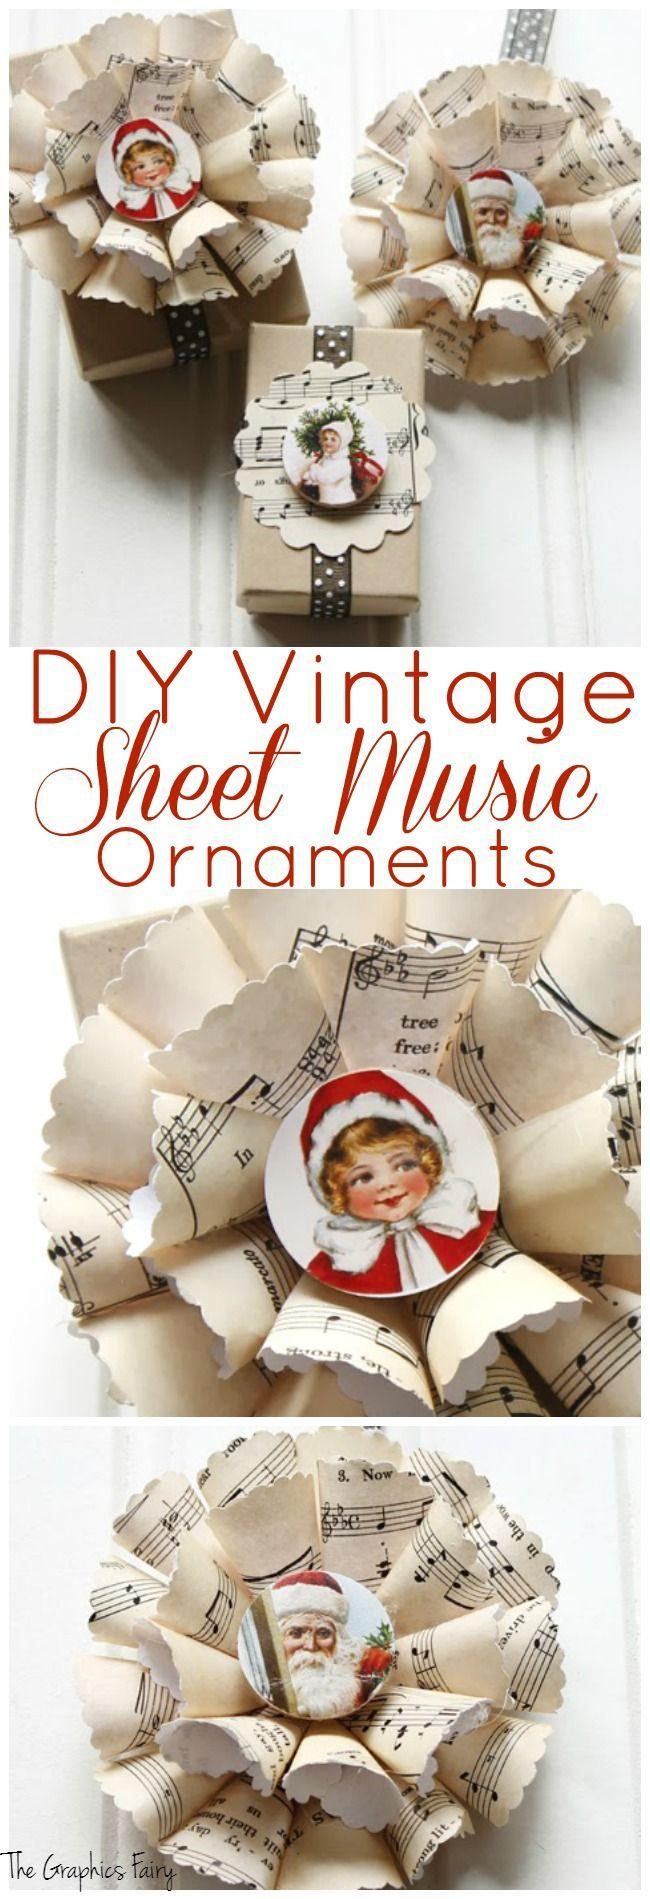 Diy retro christmas decorations - Diy Vintage Sheet Music Ornaments The Graphics Fairy